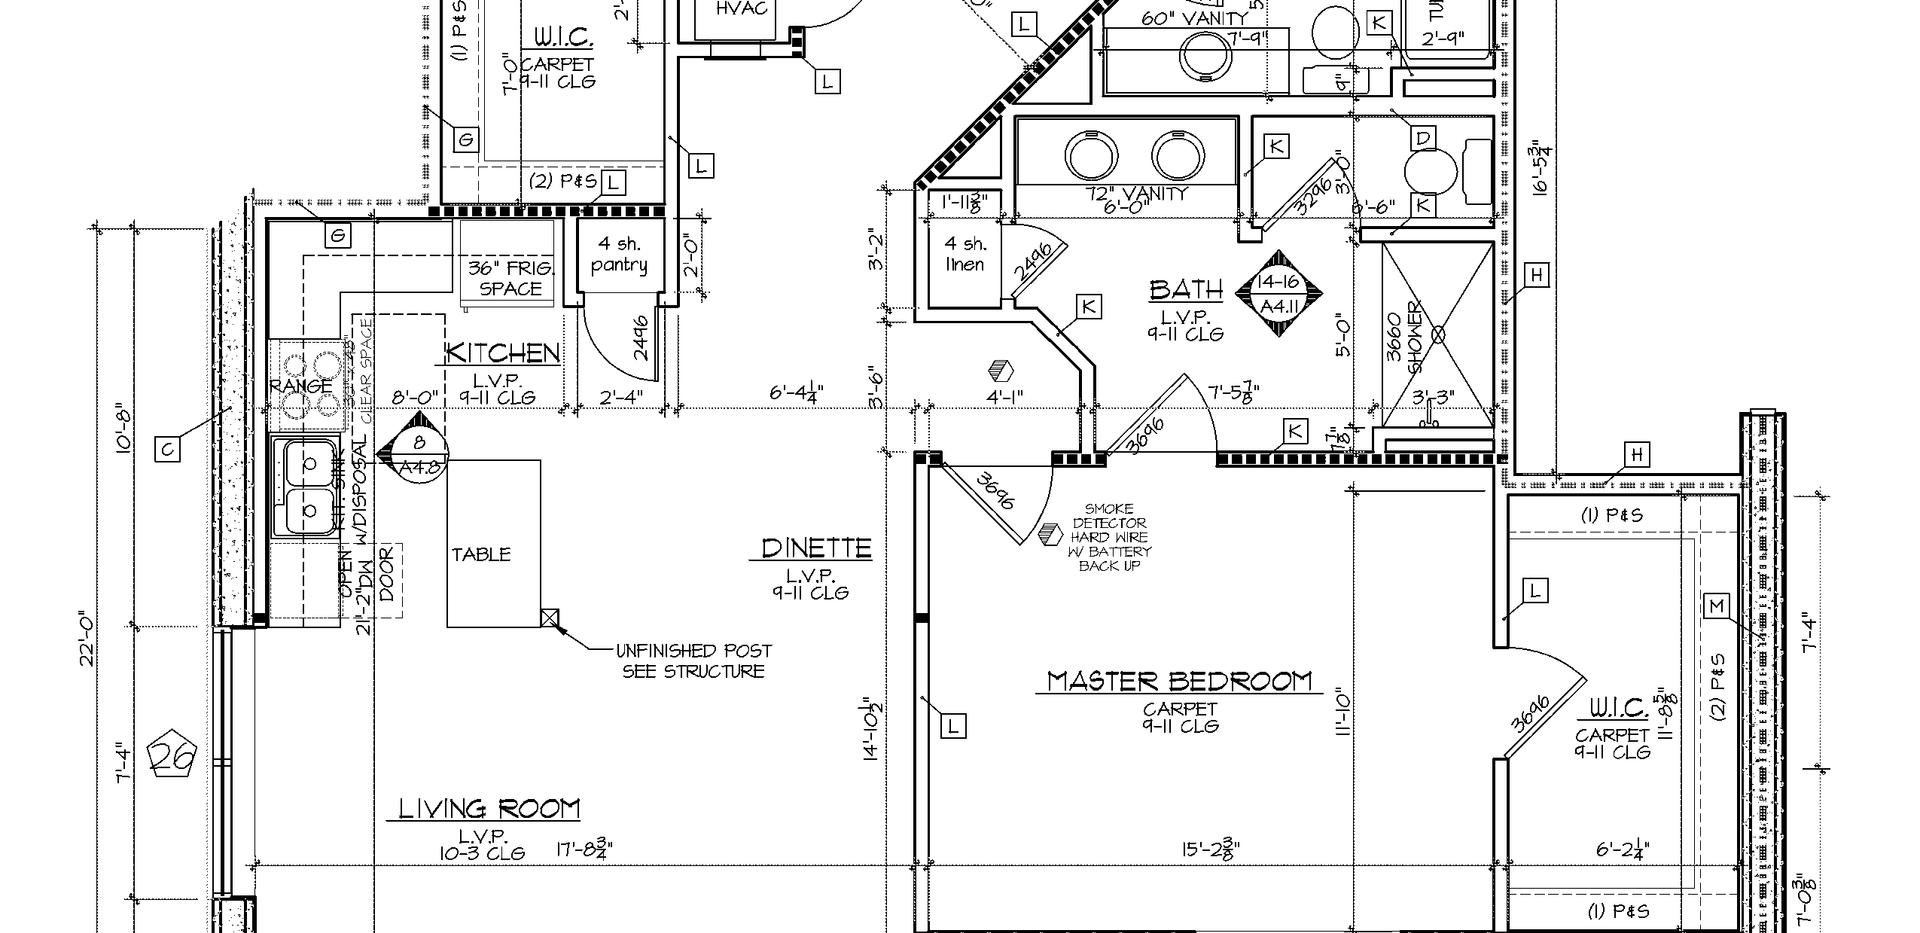 Manseau Falts - Unit Plan - X06.png